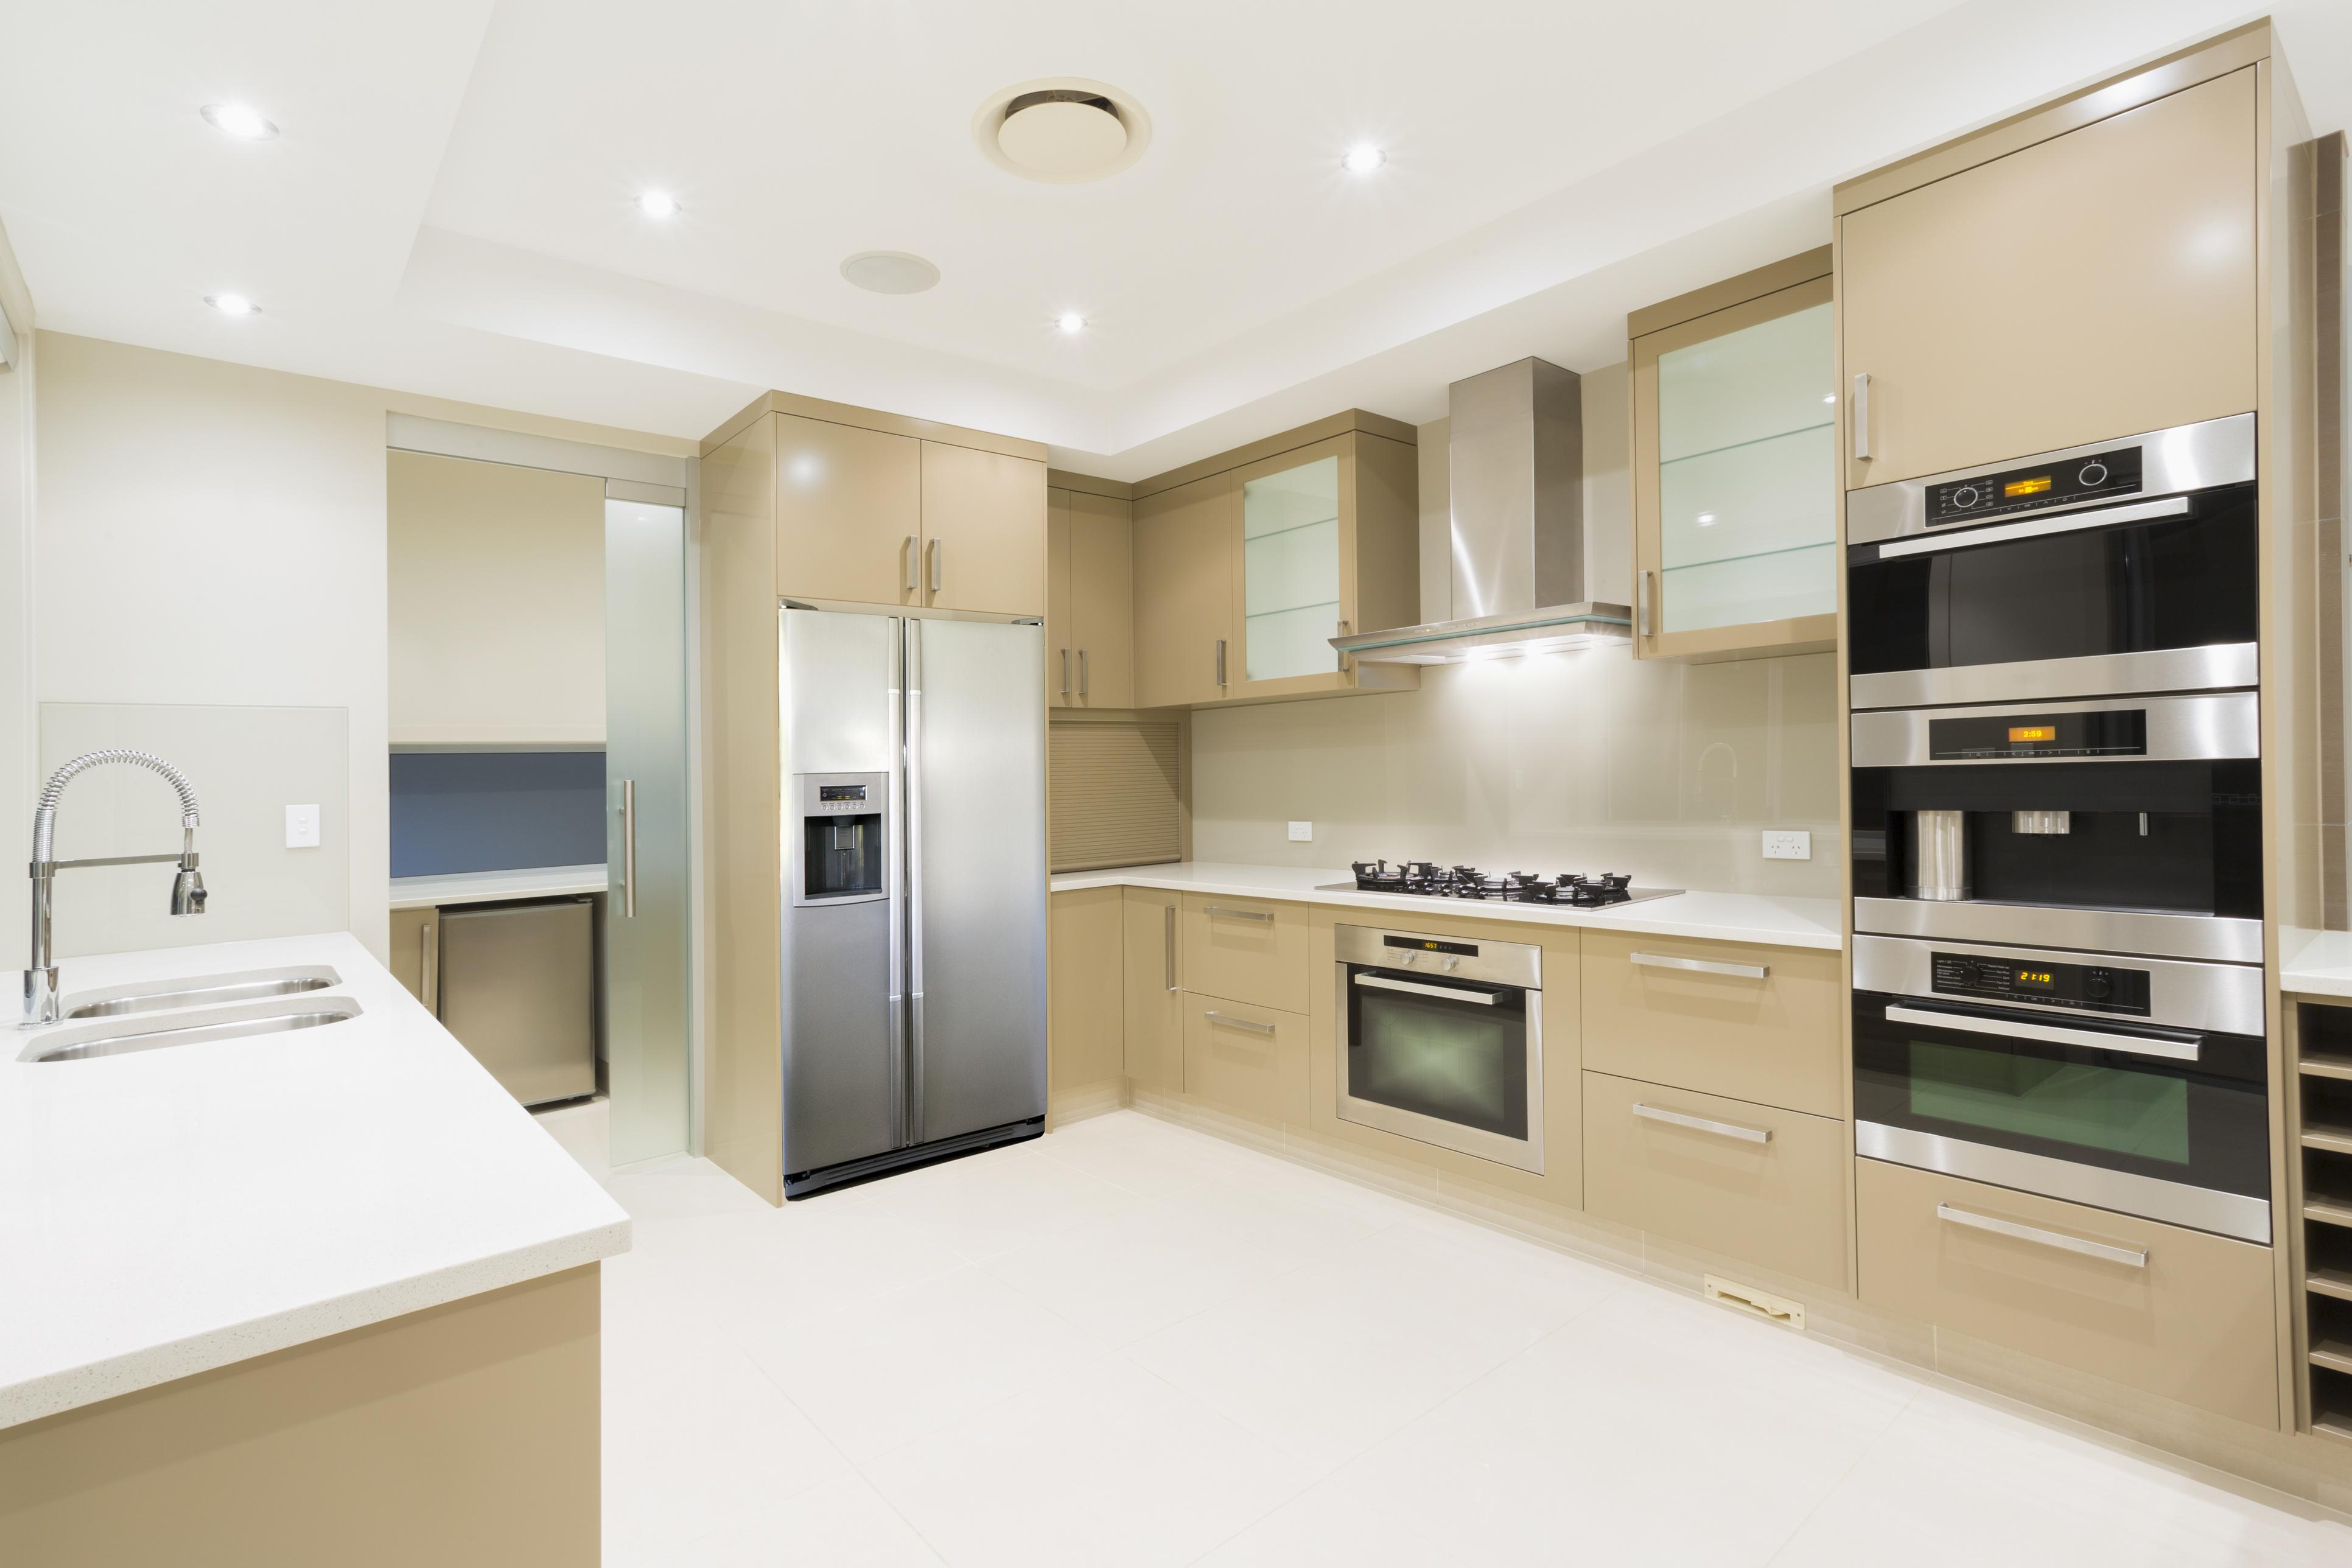 Premier interiors Ireland Ltd - swatragh, County Londonderry  - 07540 404671 | ShowMeLocal.com